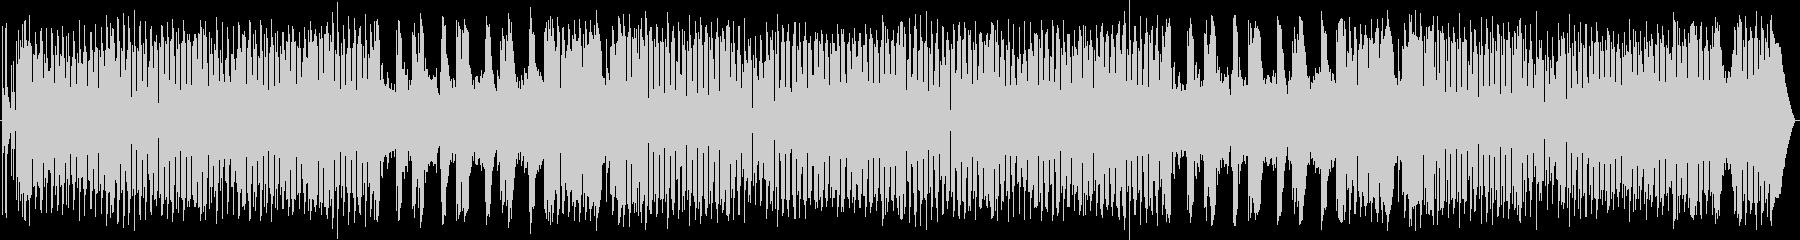 B3オルガンのタッチで素晴らしいリ...の未再生の波形